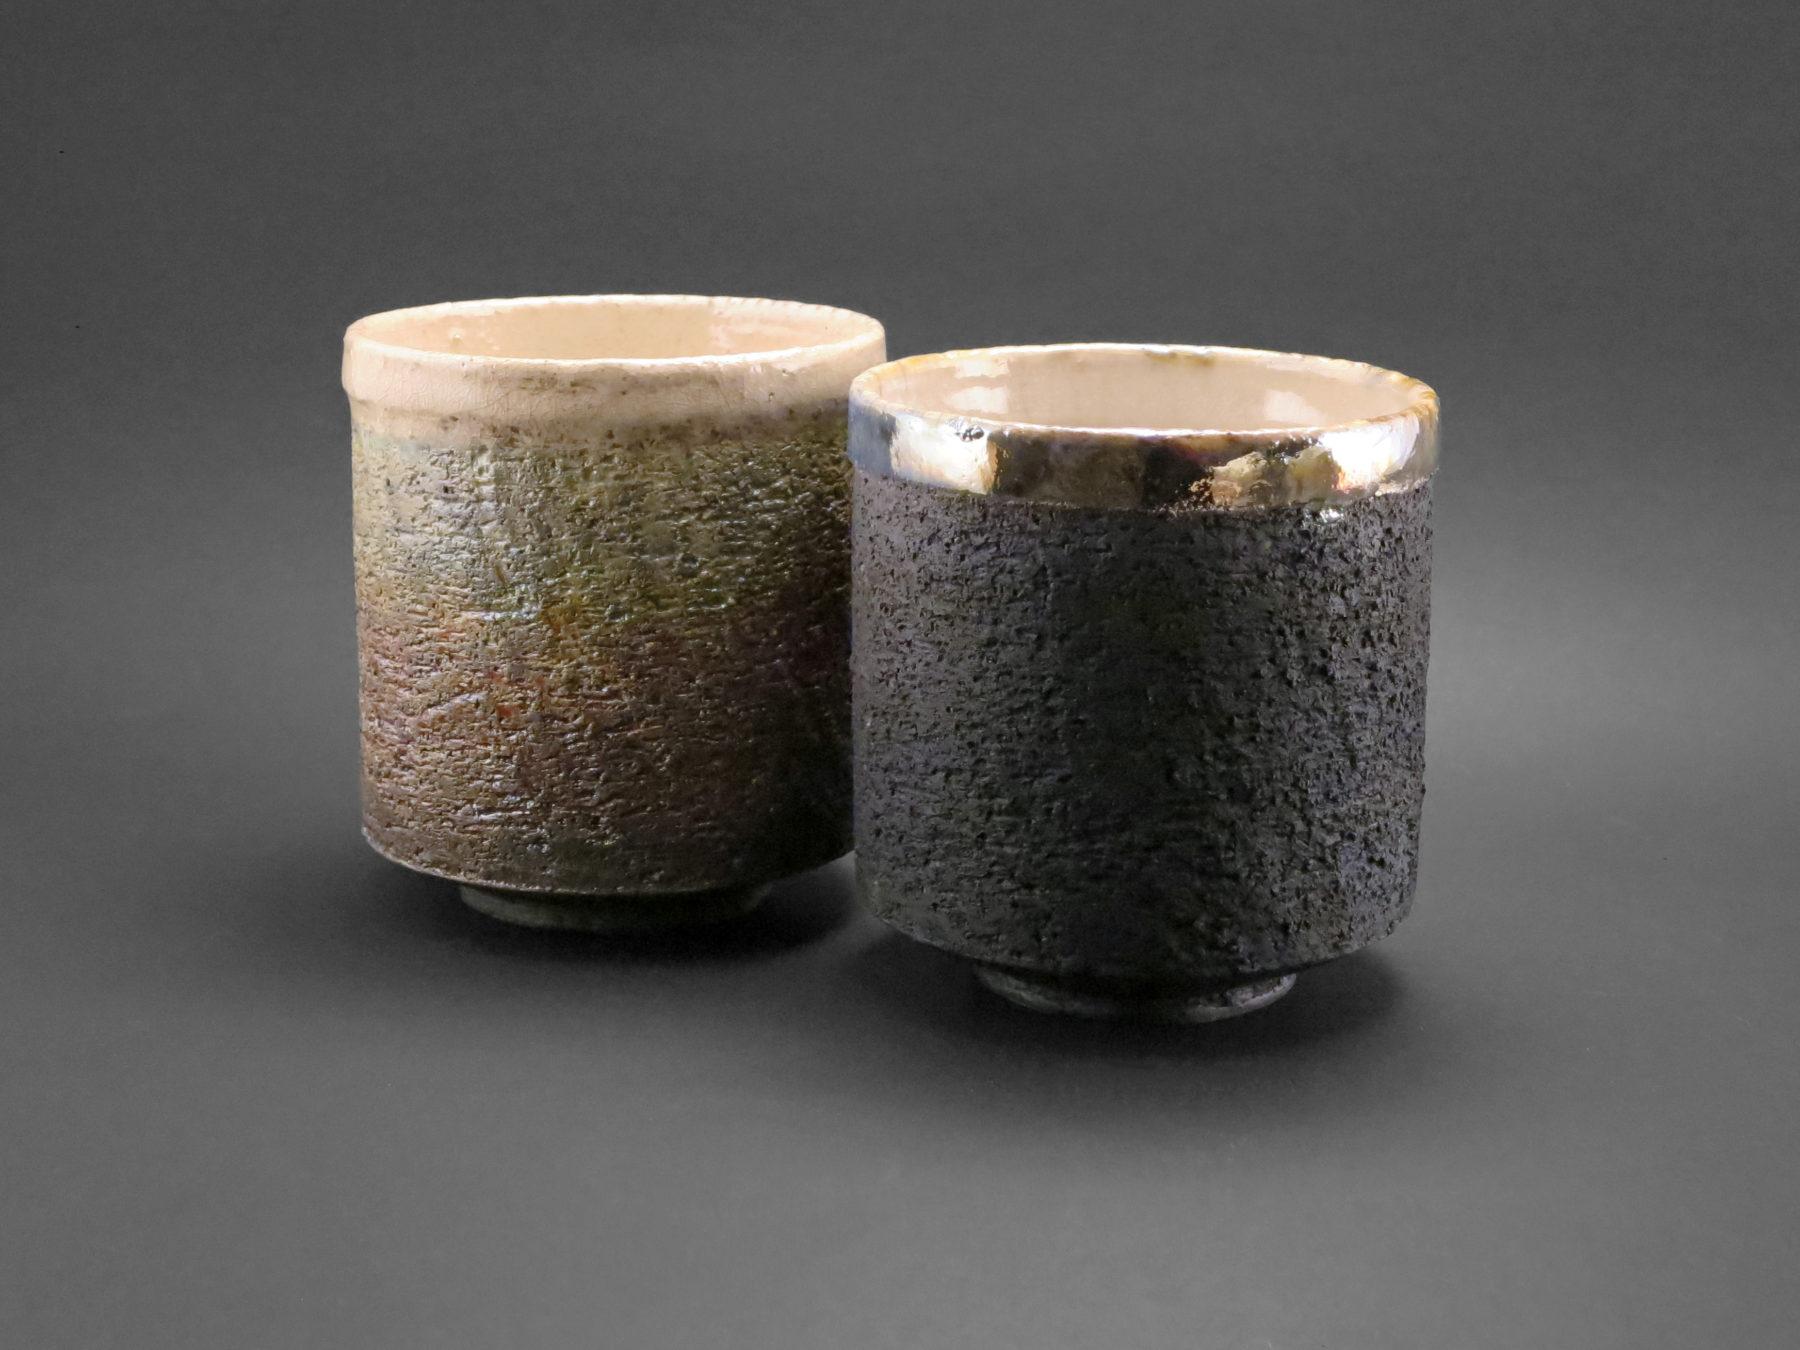 Moss and Carbon Cappuccino Cups - Ildikó Károlyi